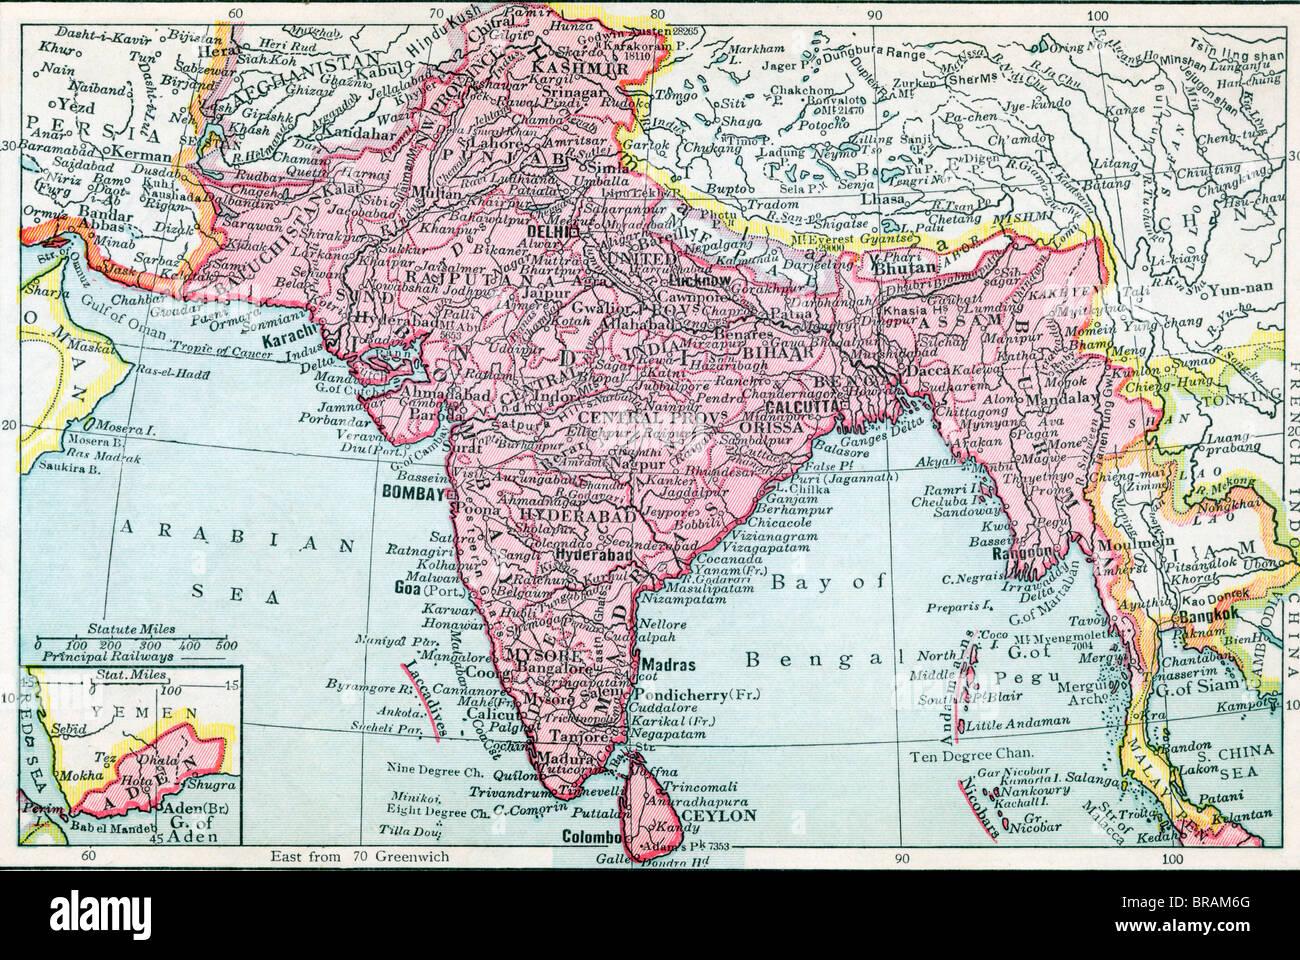 The Indian Empire and Ceylon circa 1930. Inset shows Aden. - Stock Image